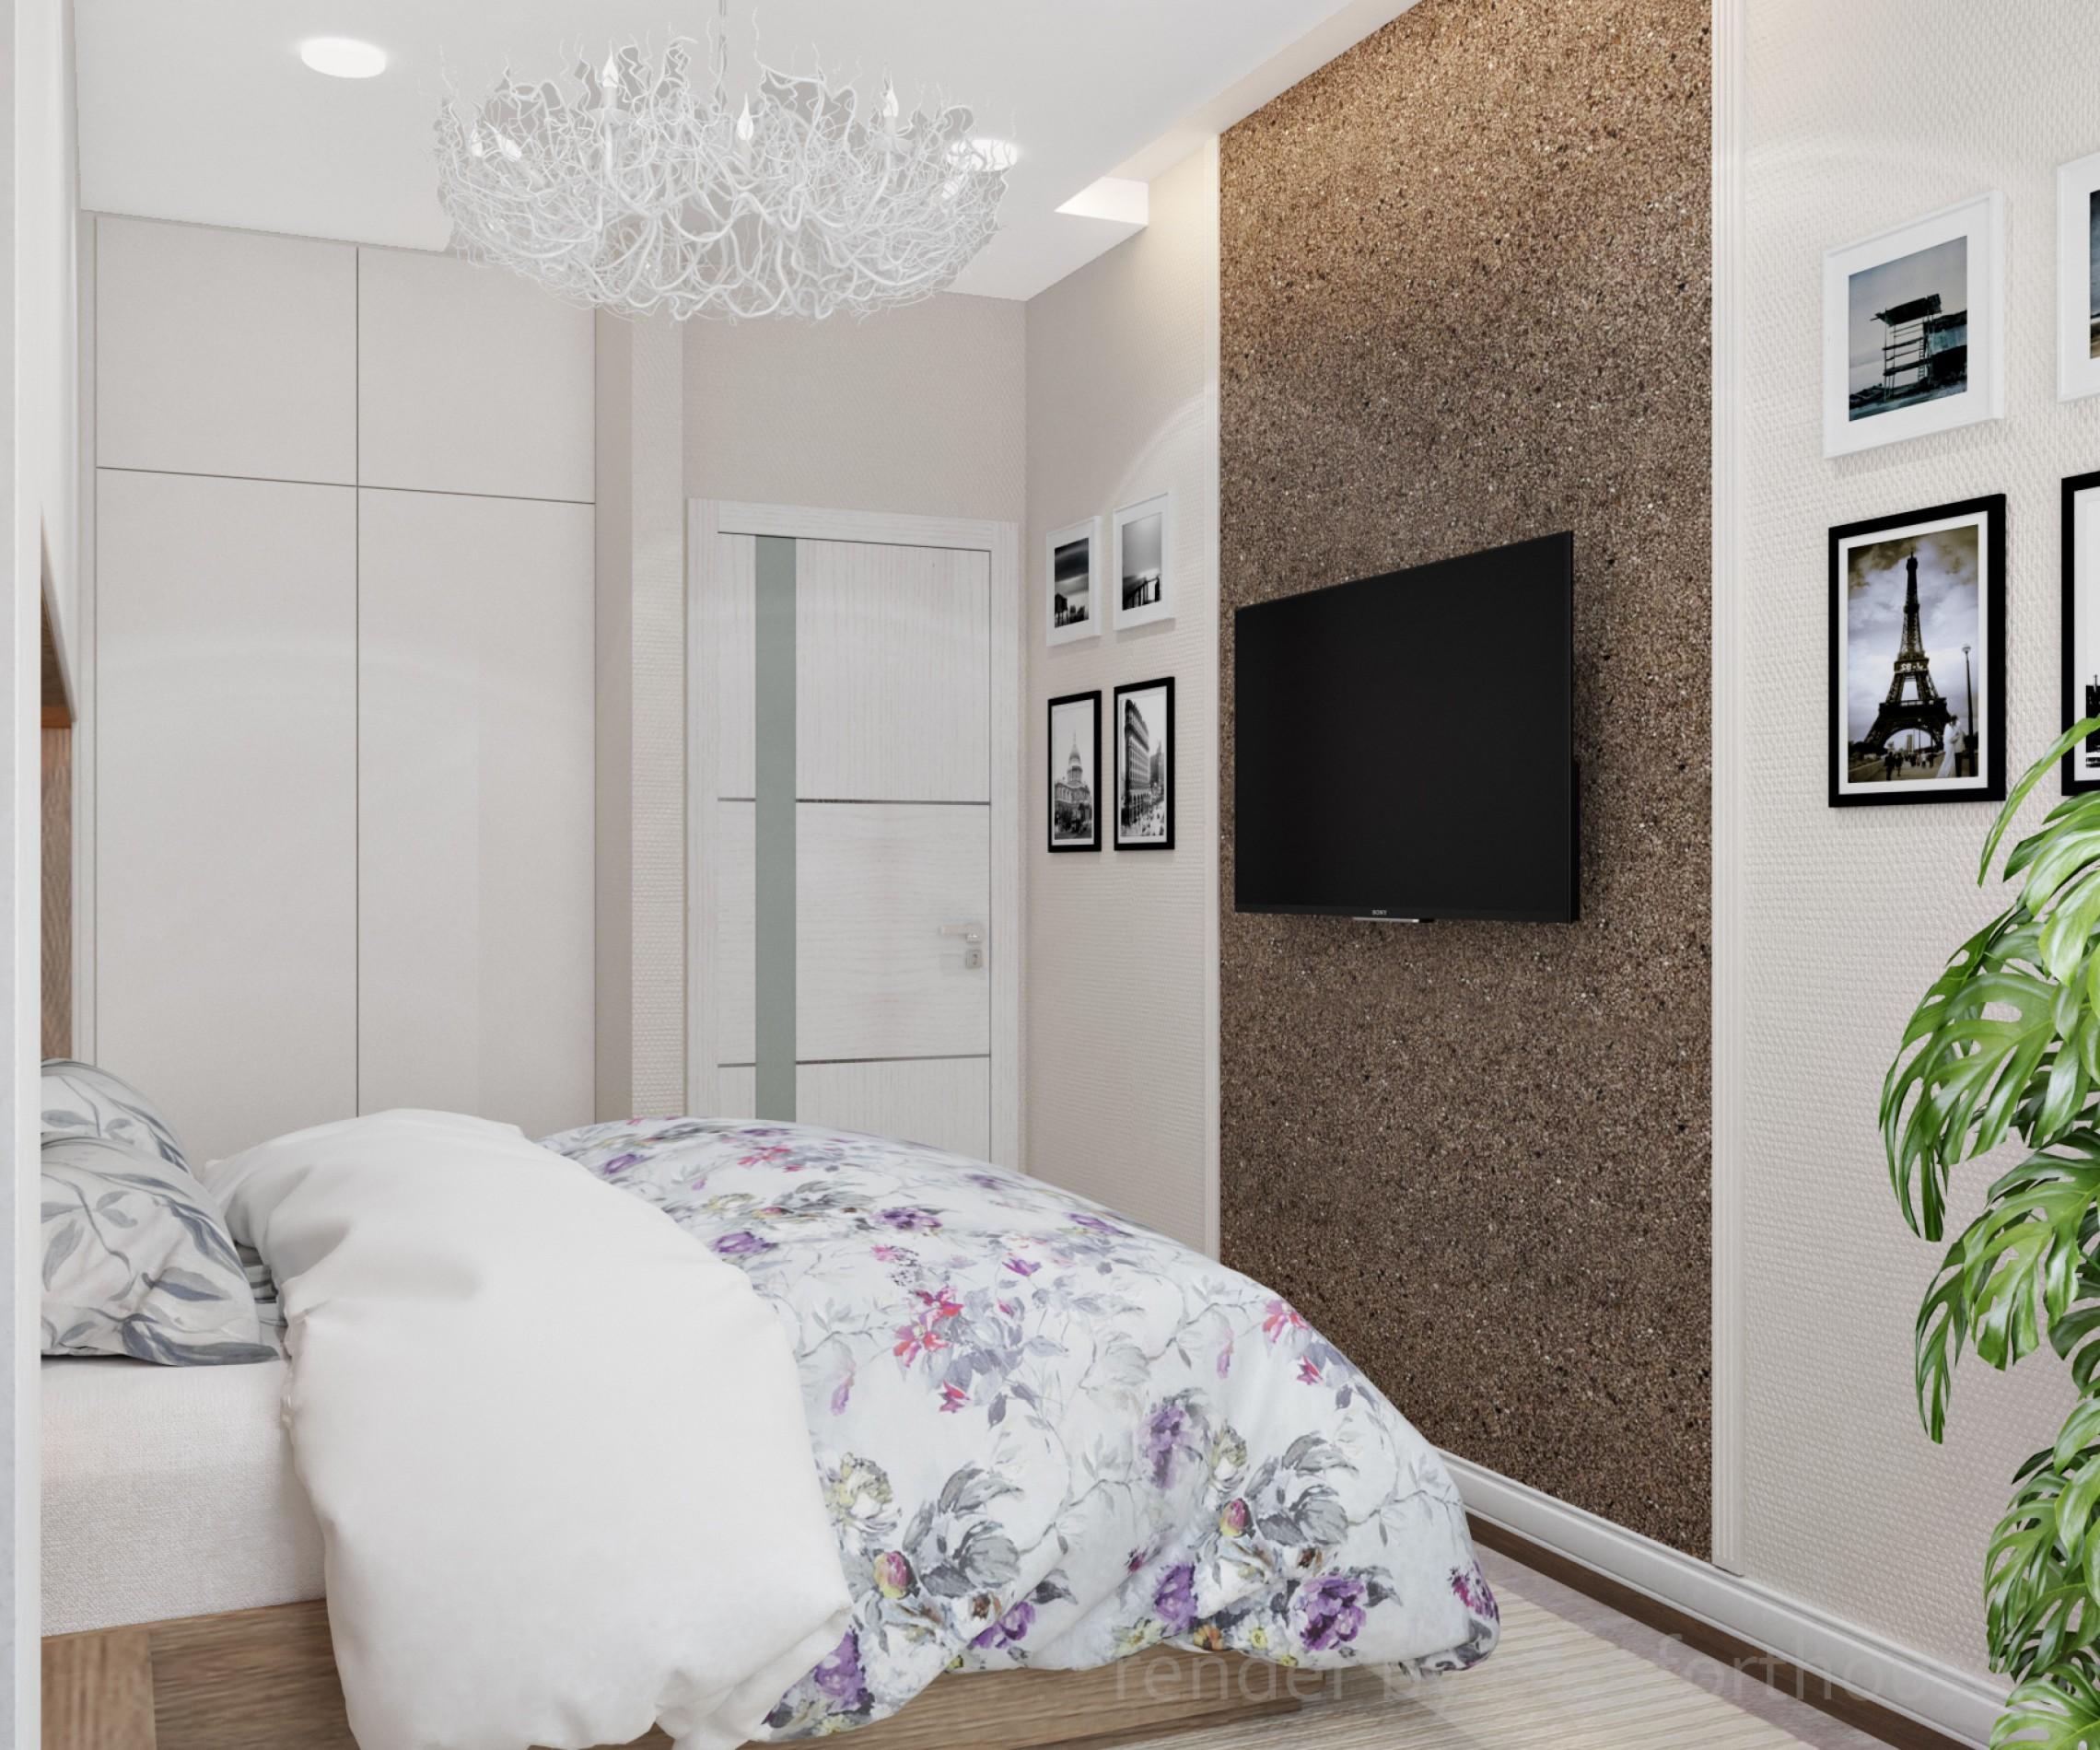 townhouse interior bedroom